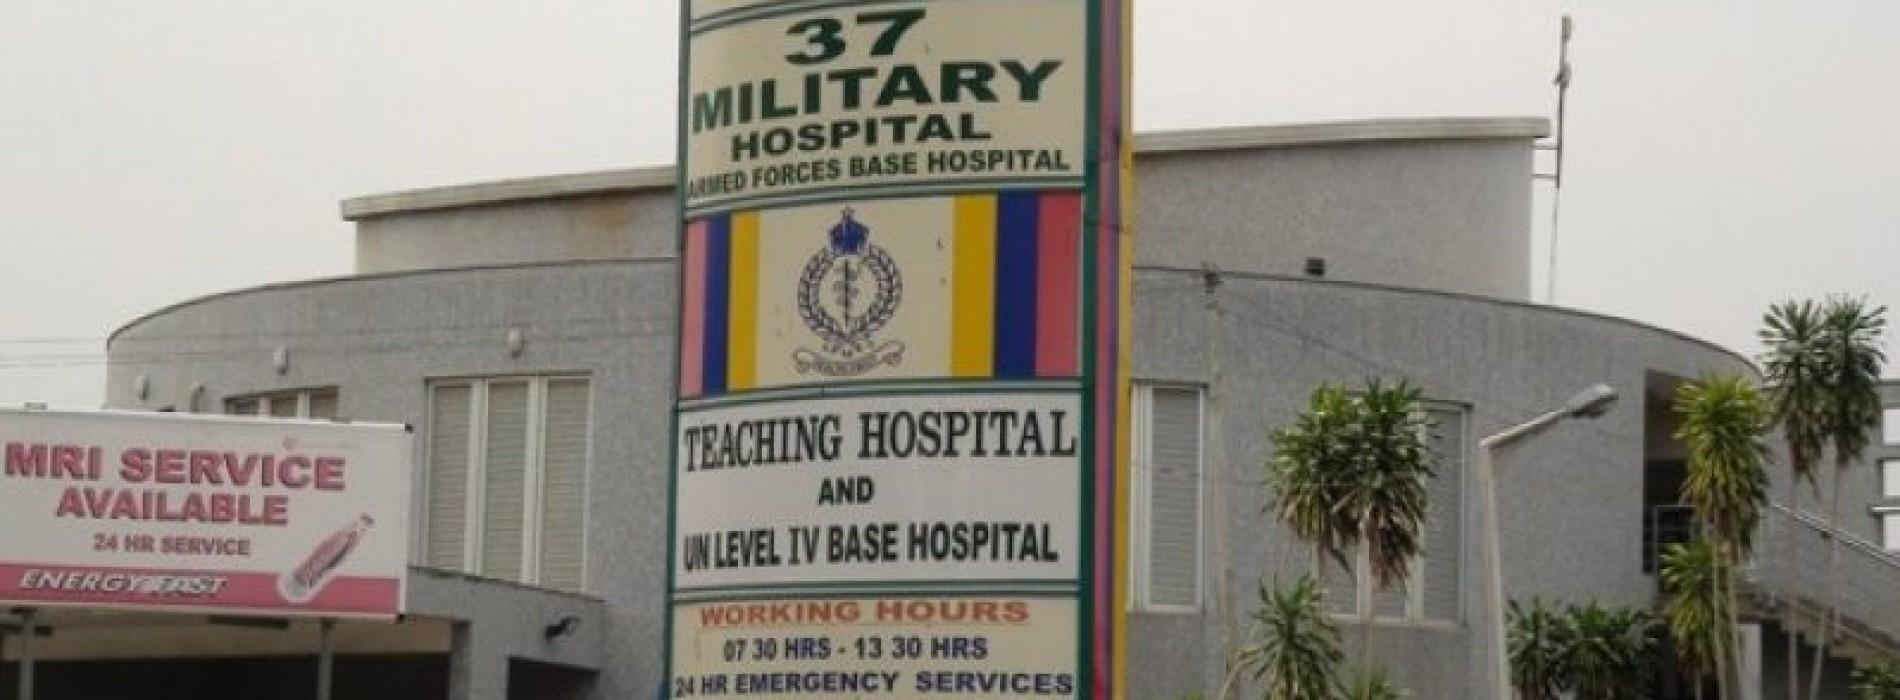 Male baby boom in Ghana's military hospital